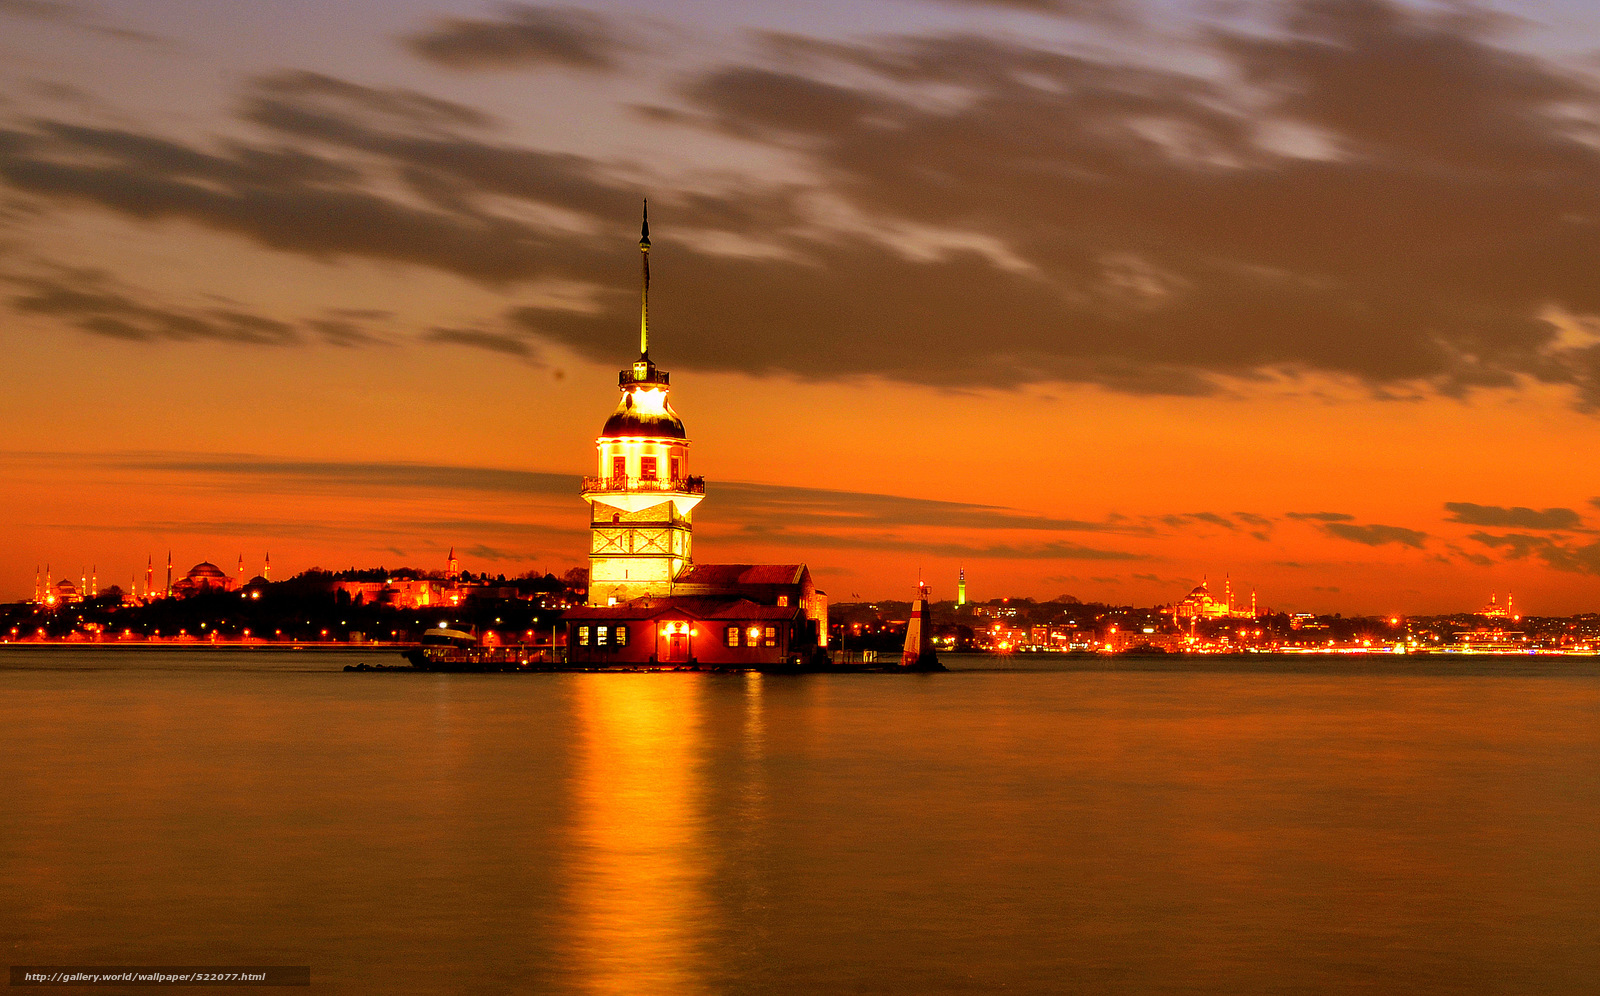 Download wallpaper istanbul, sunset, city, lights free desktop ...: gde-fon.com/download/istanbul_sunset_city_lights/522077/3359x2092